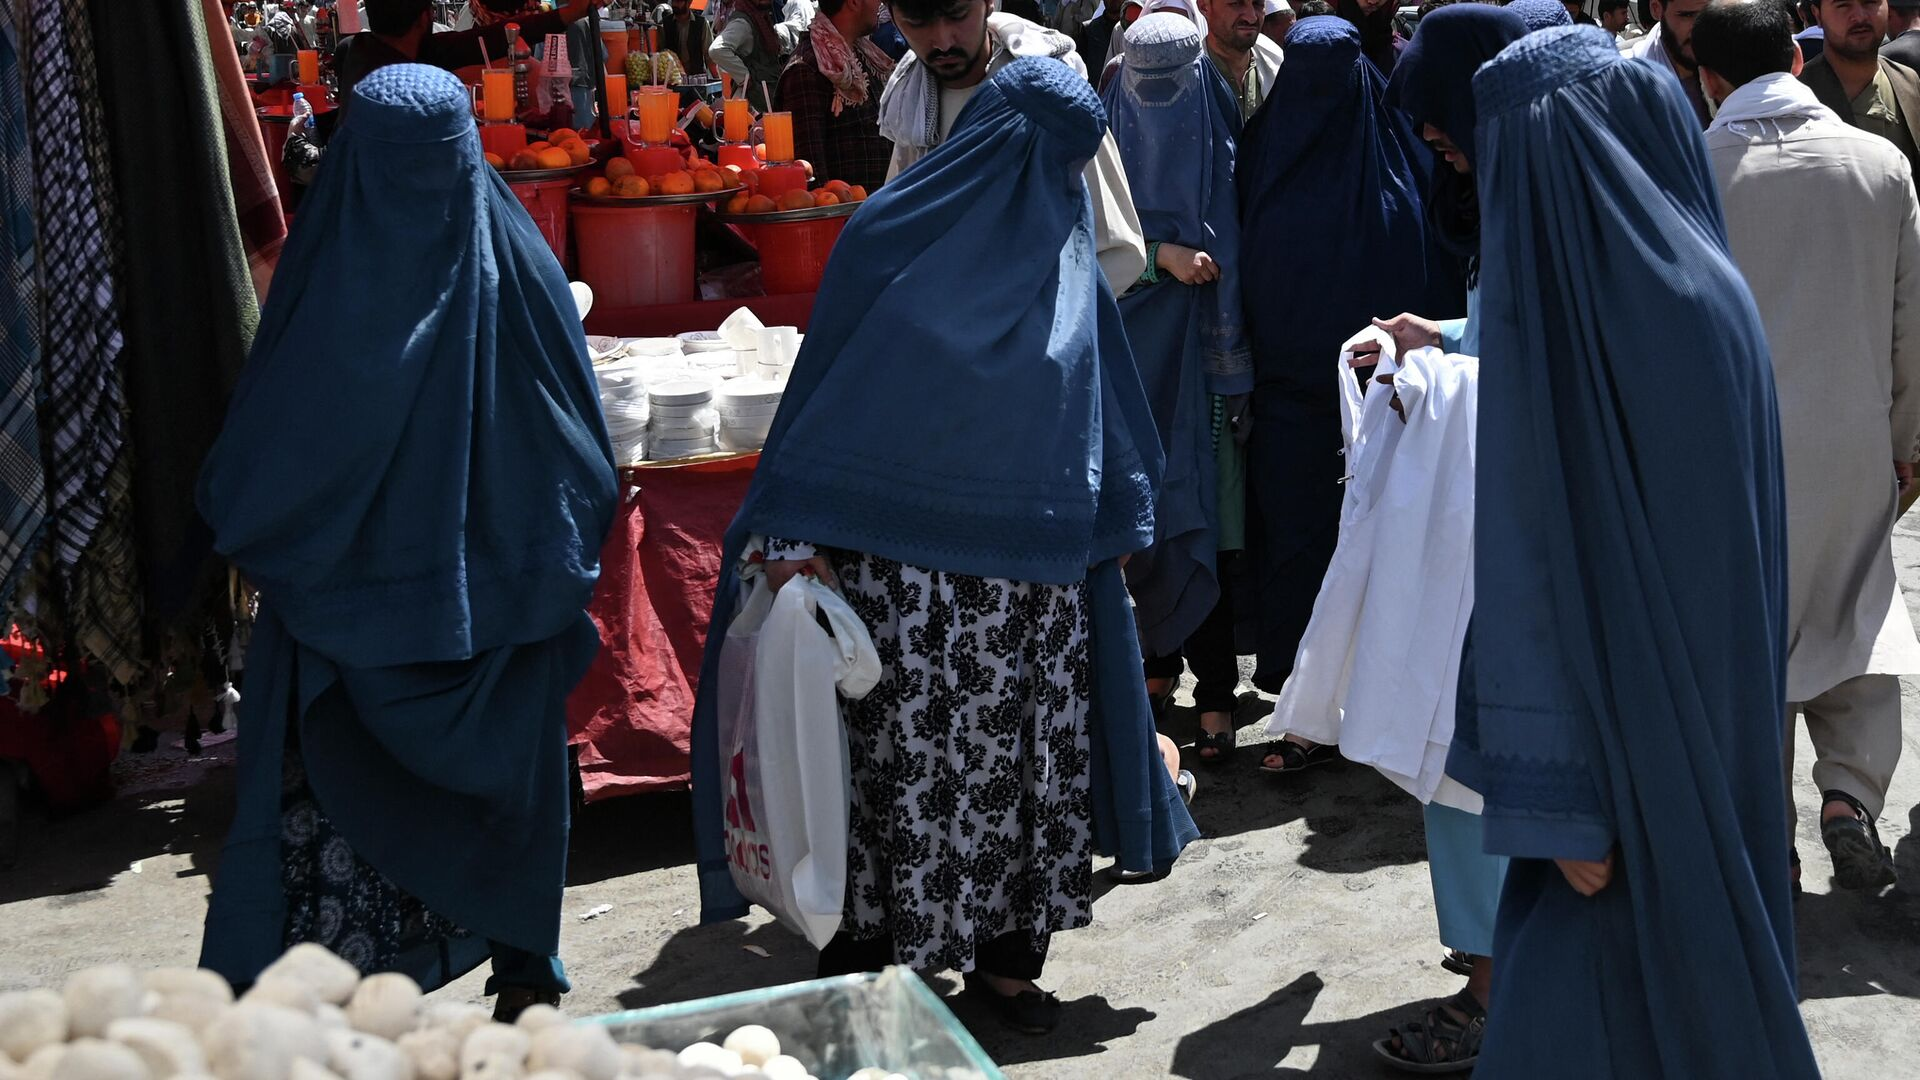 Mujeres afganas (imagen referencial) - Sputnik Mundo, 1920, 30.08.2021